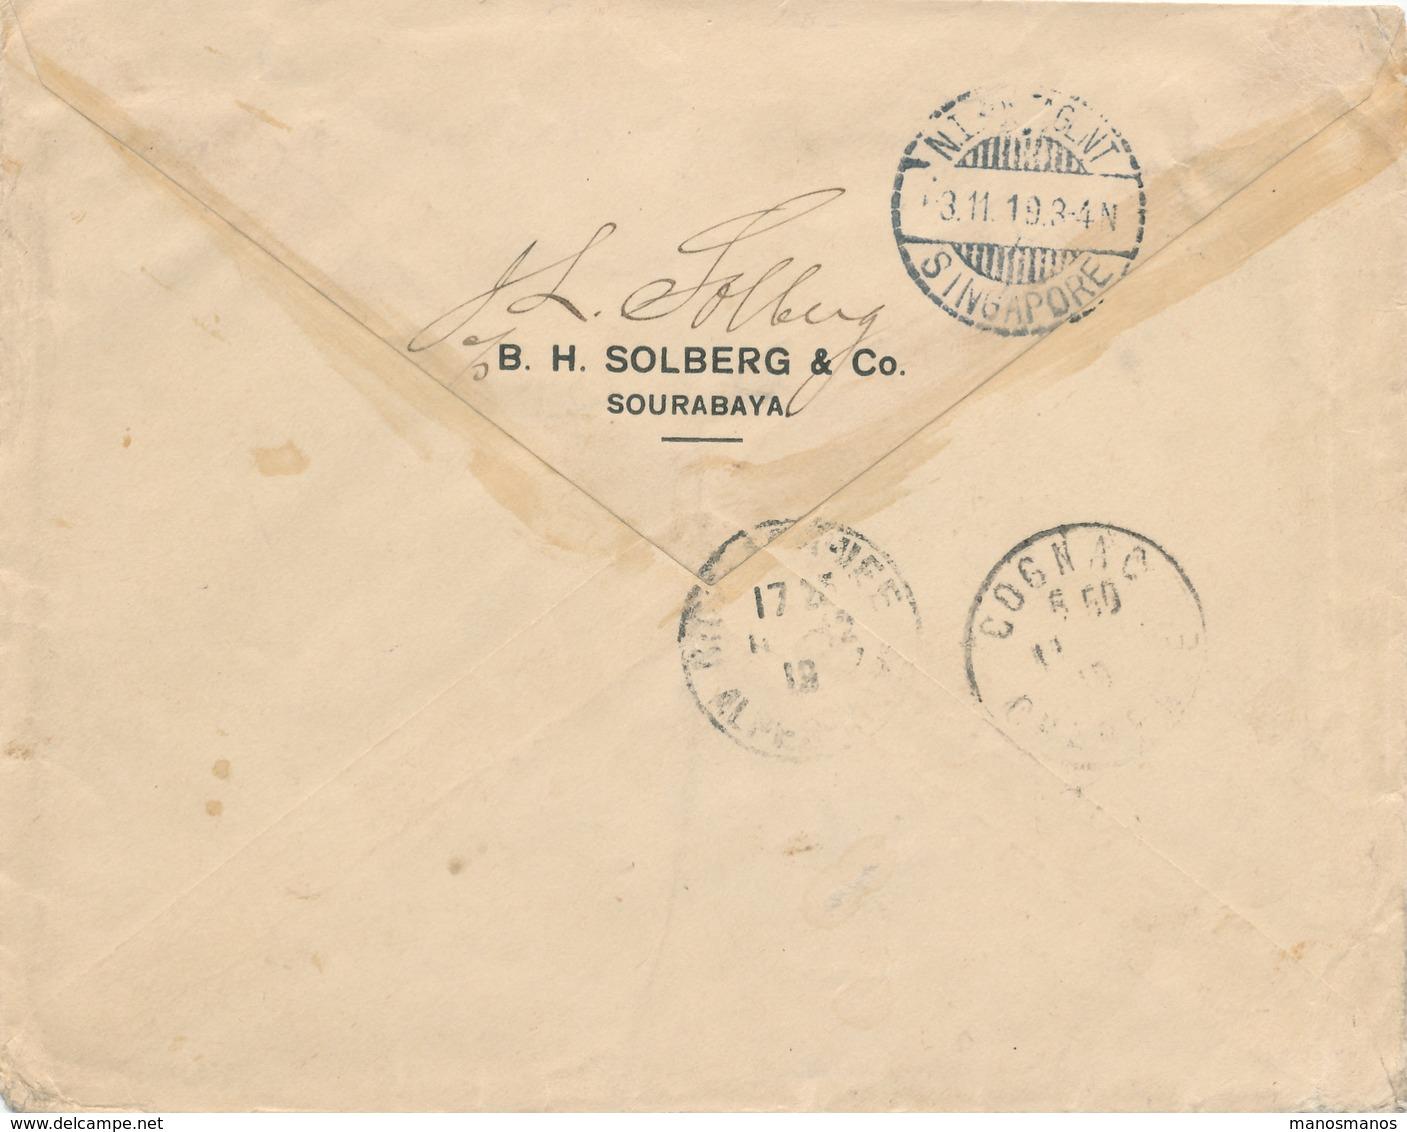 269/27 - SINGAPORE / NL INDIES - Lettre TP NL Indies GAROET 1919 Vers NICE Via N.I. Postagent SINGAPORE - Indes Néerlandaises